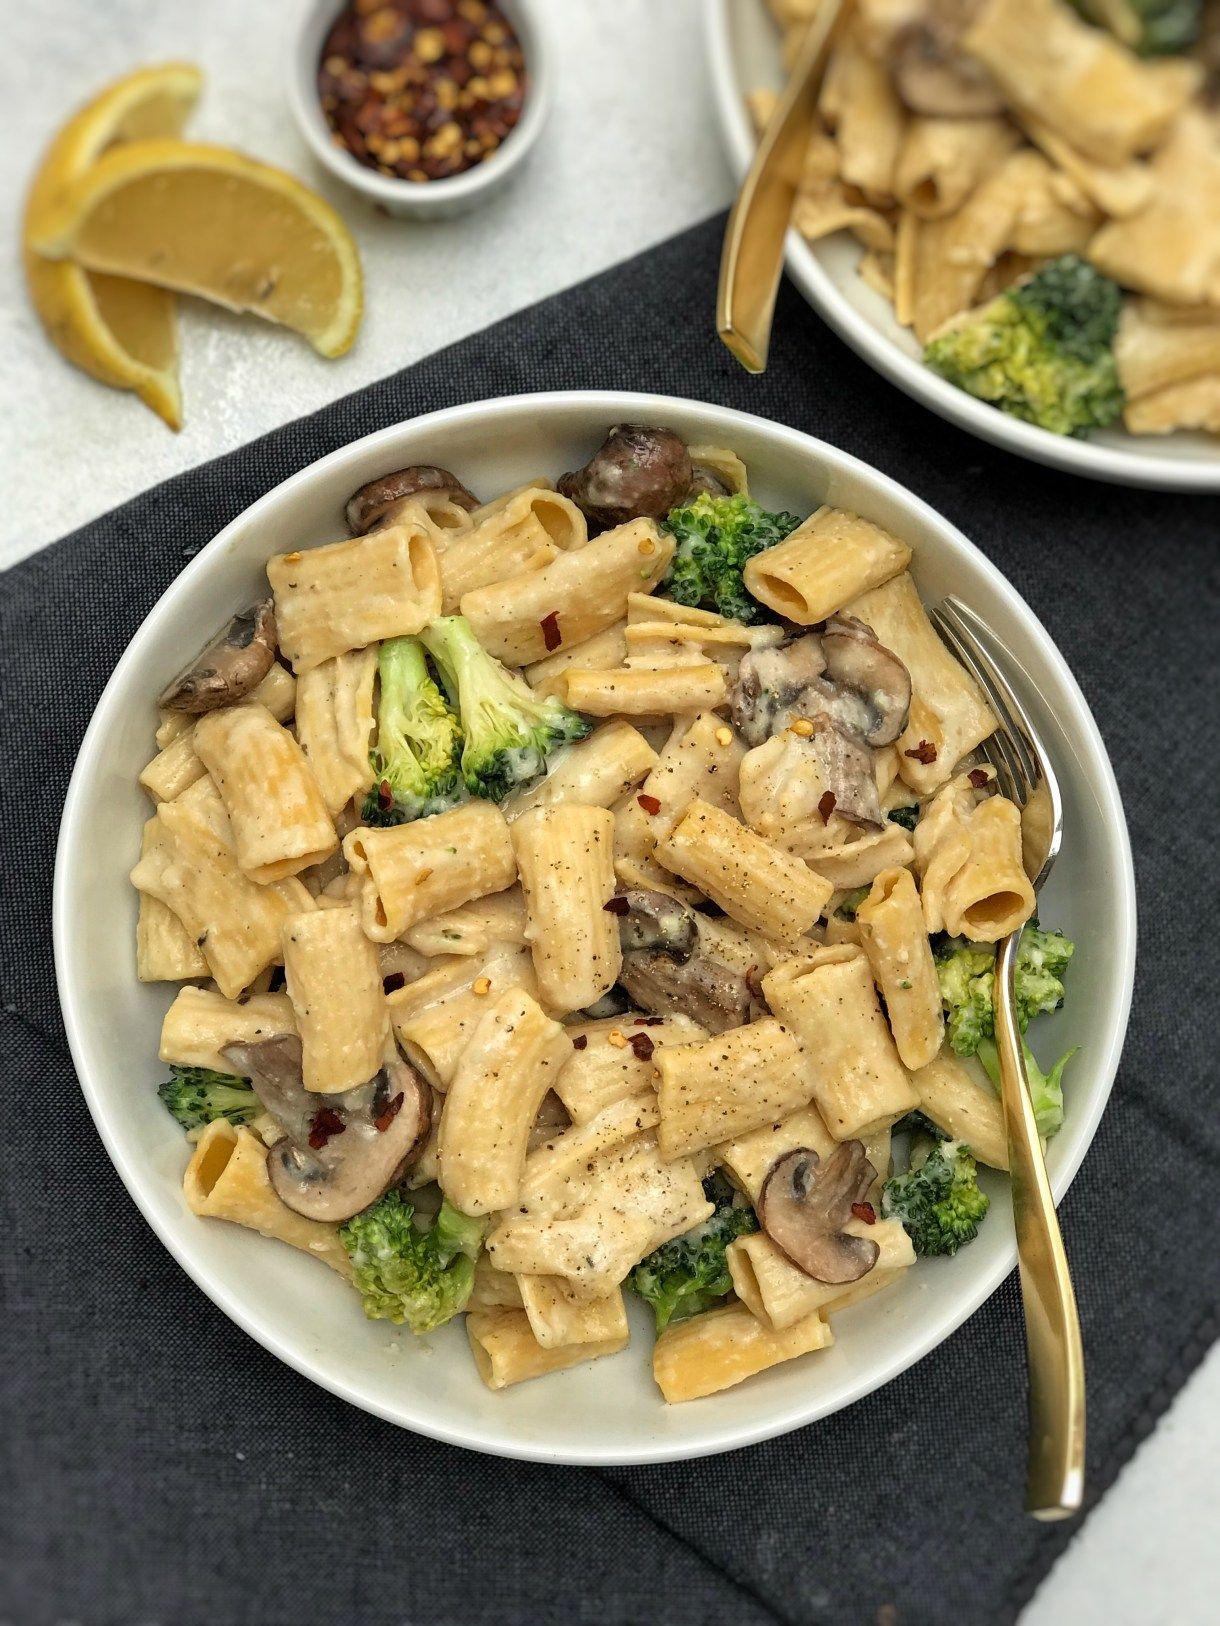 Mushroom Broccoli Rigatoni With Lemon Garlic Cream Sauce Recipe